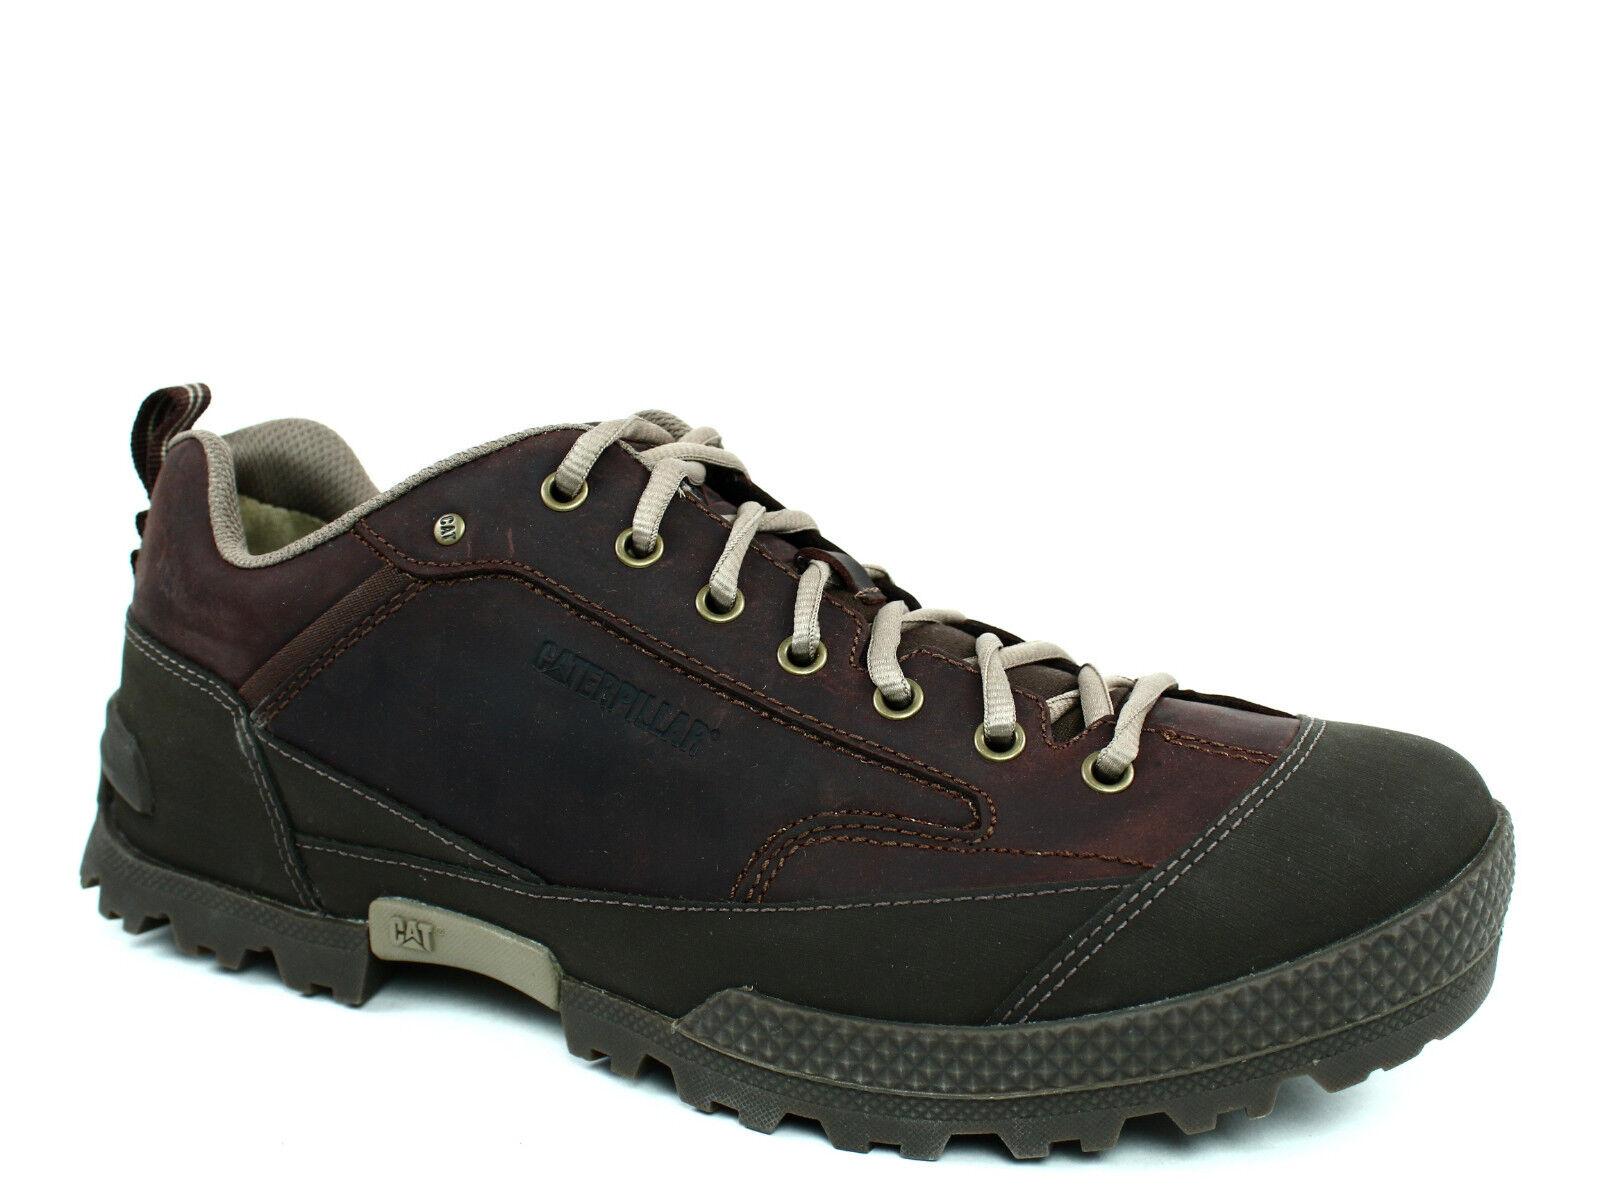 Caterpillar REZNOR Oxford Uomo Work Casual  Brown Pelle/Nubuck Shoes Scarpe da Ginnastica